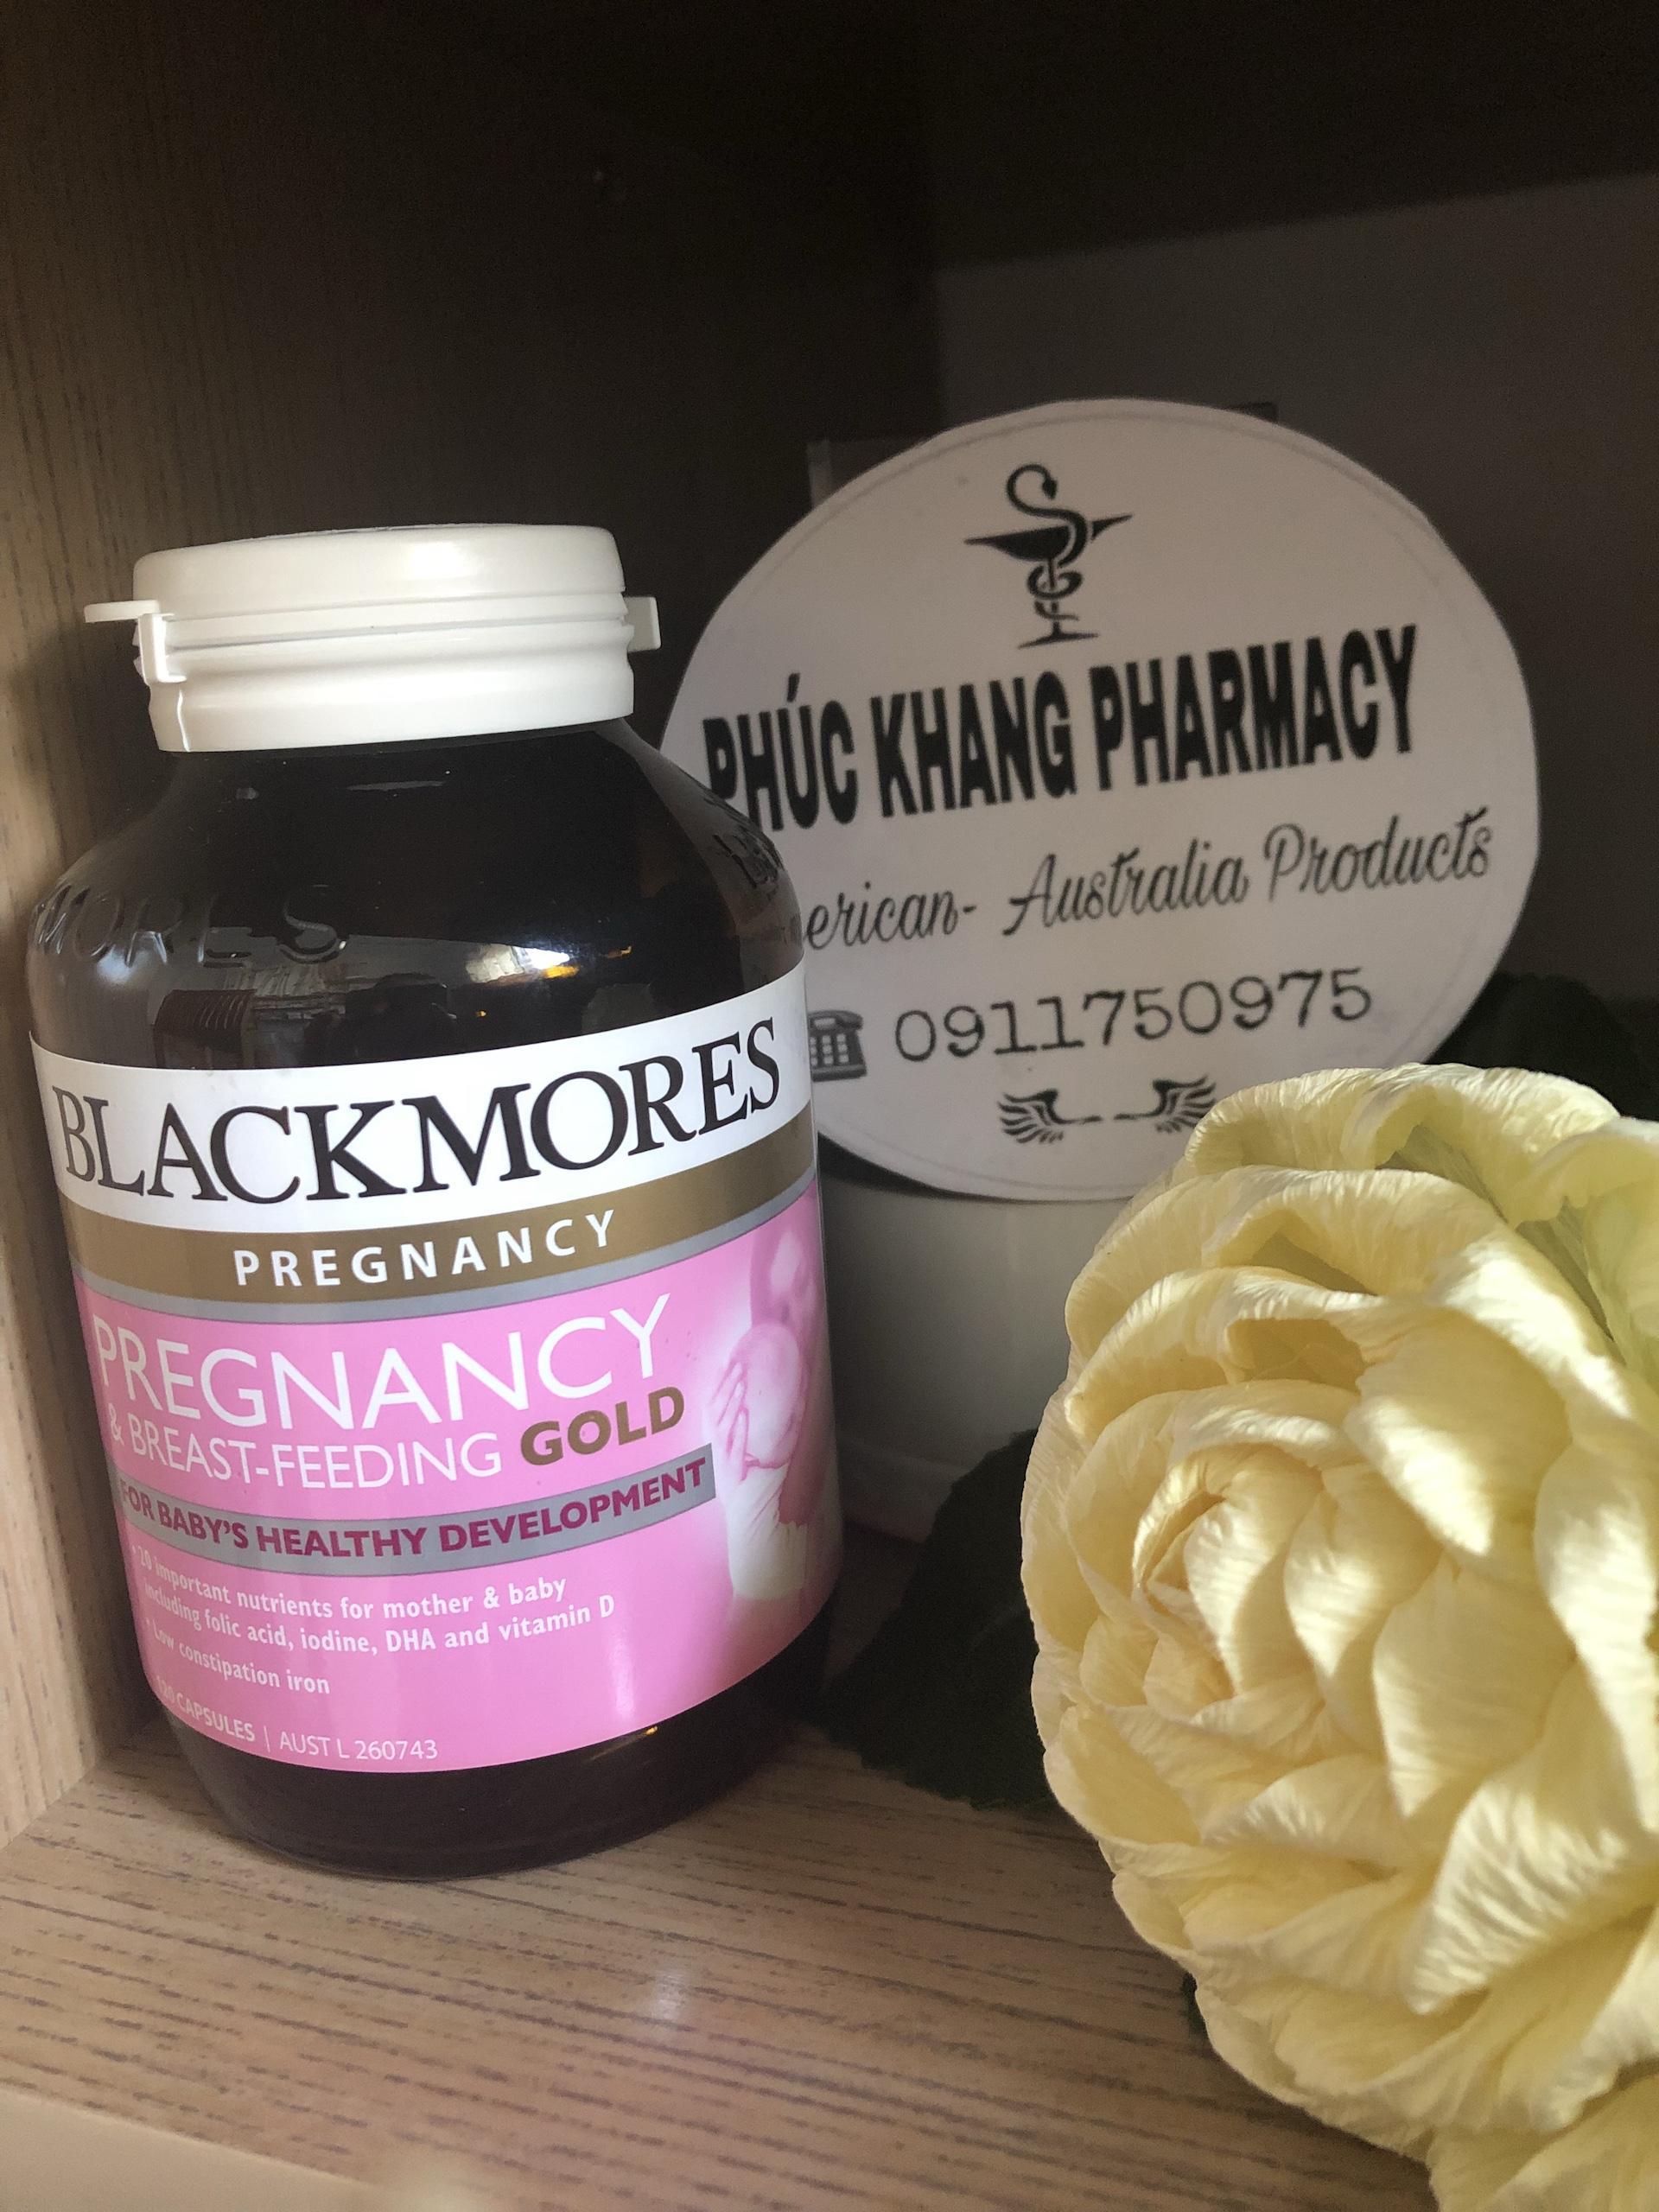 Thực phẩm bảo vệ sức khỏe Blackmores Pregnancy & Breast-Feeding Gold